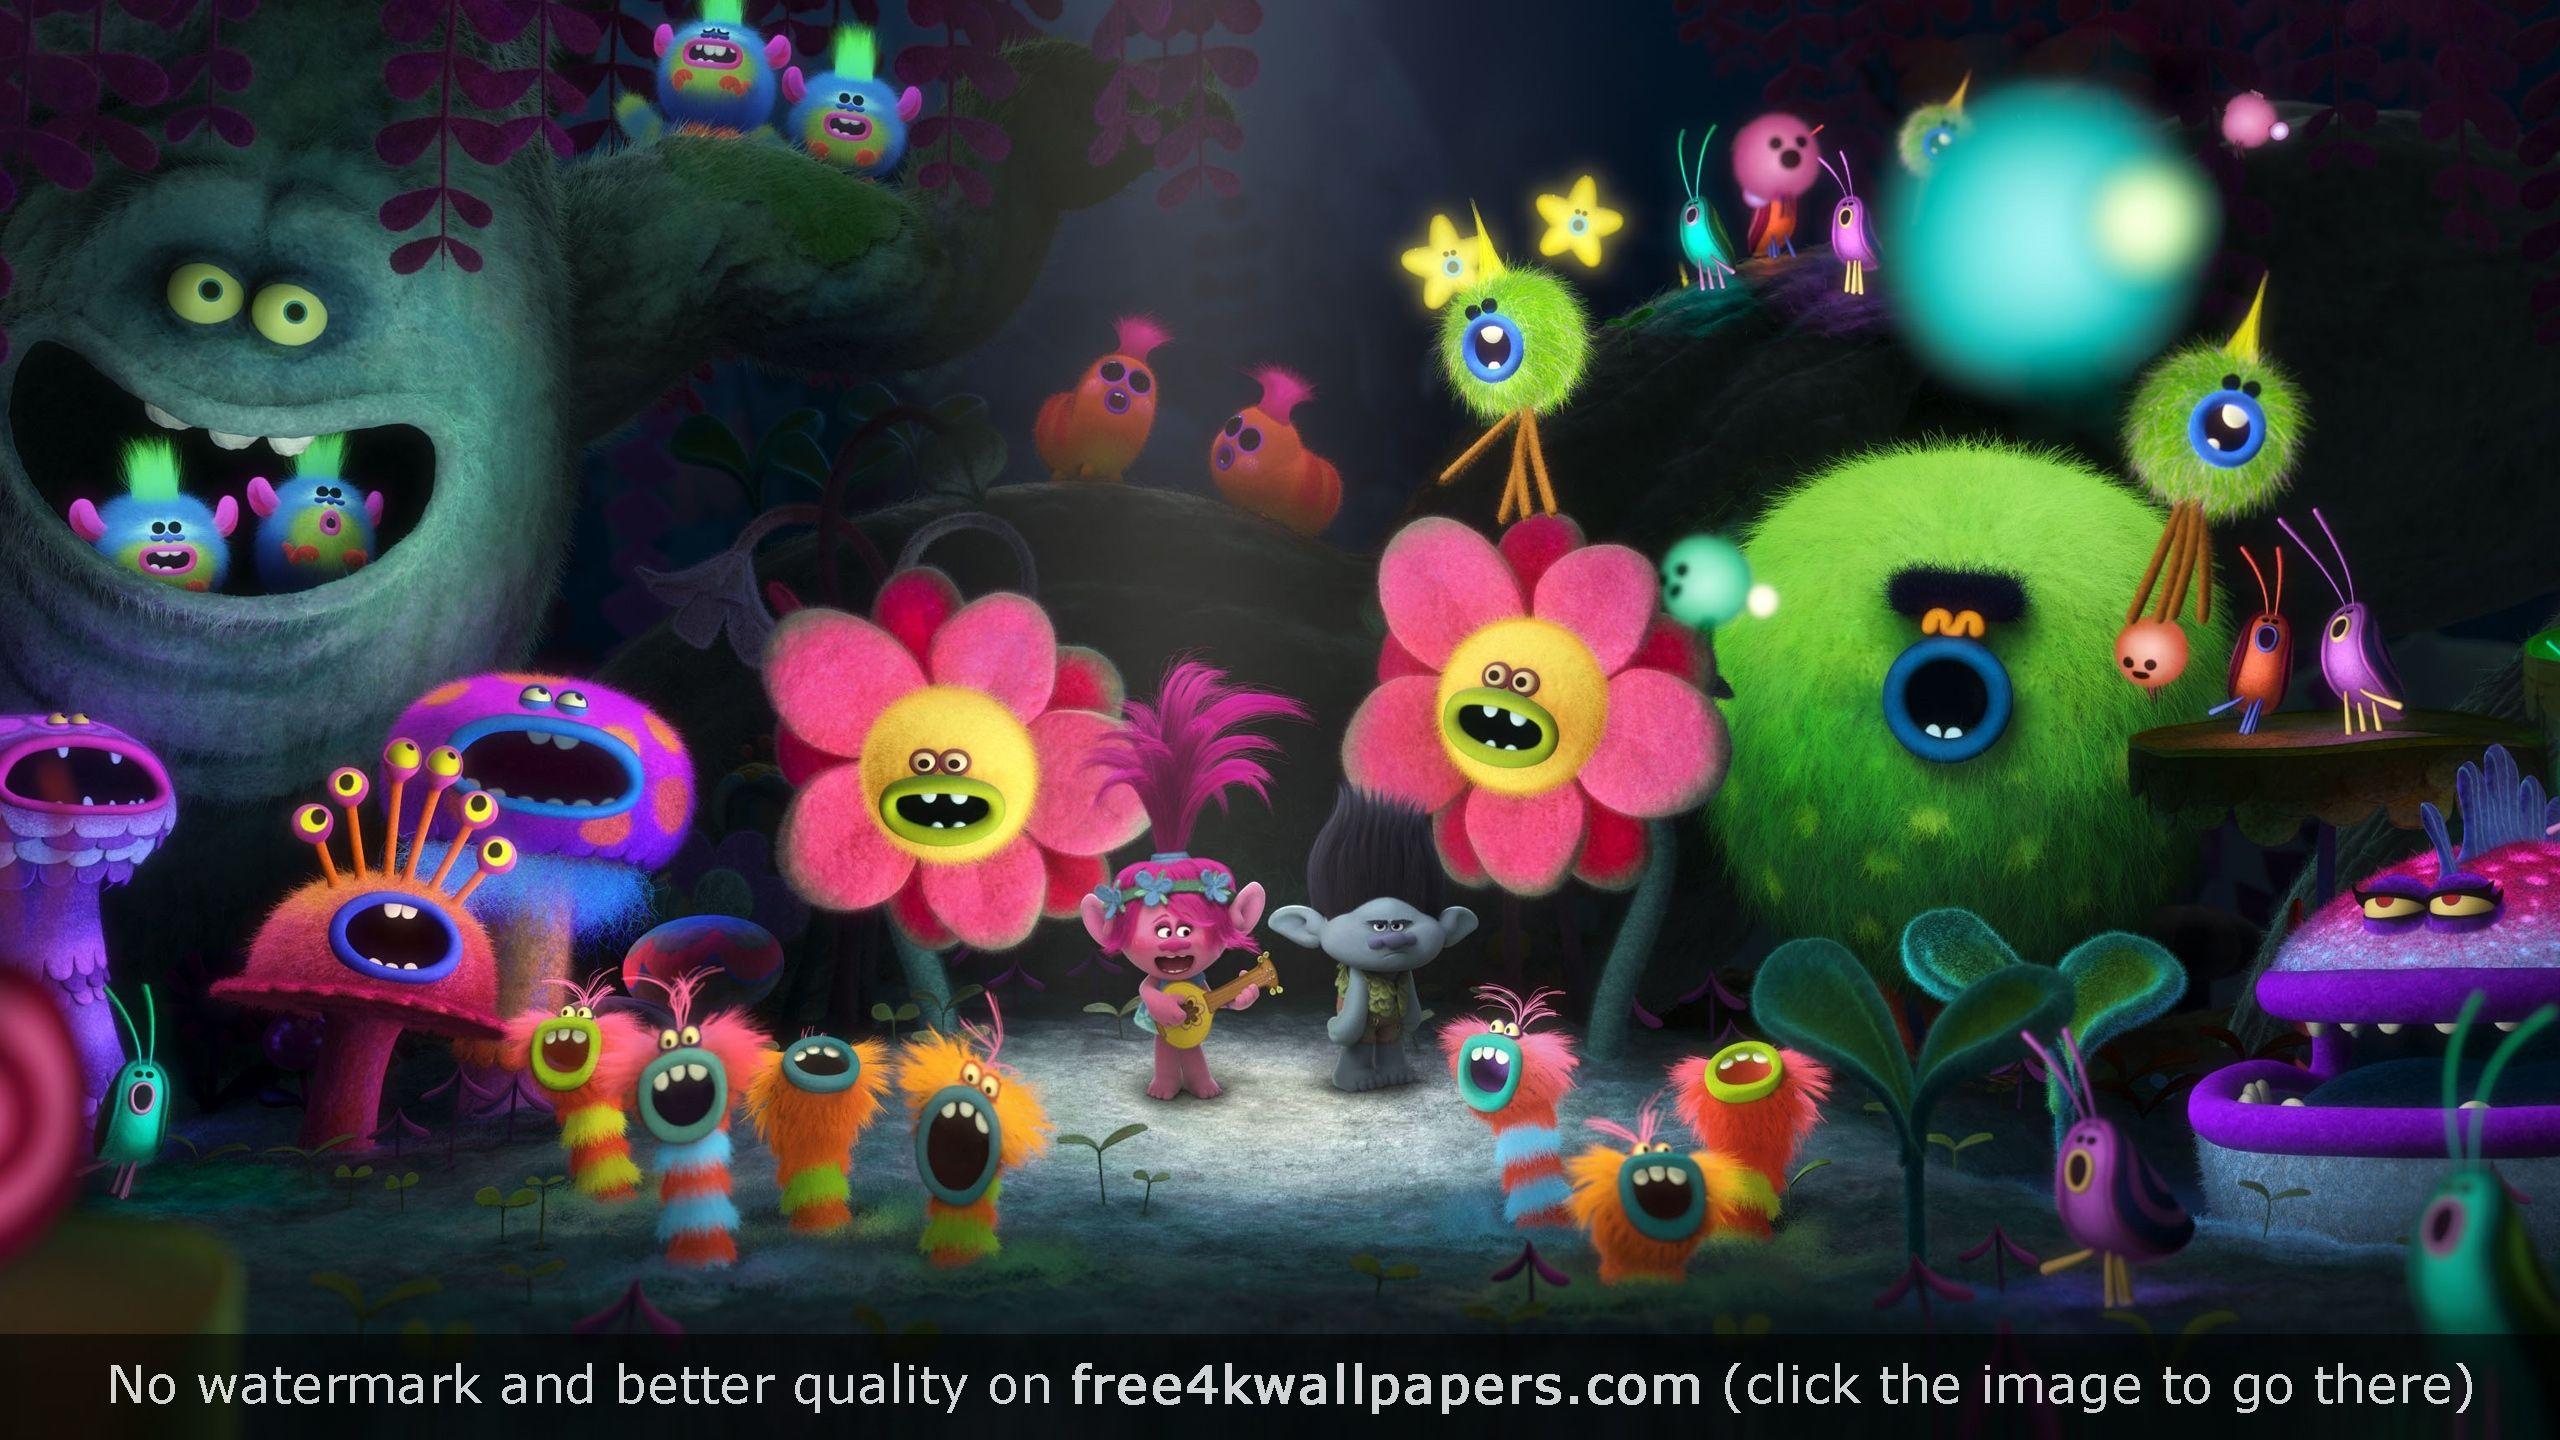 Trolls Movie Hd Wallpaper Trolls Movie Trolls Birthday Dreamworks Animation